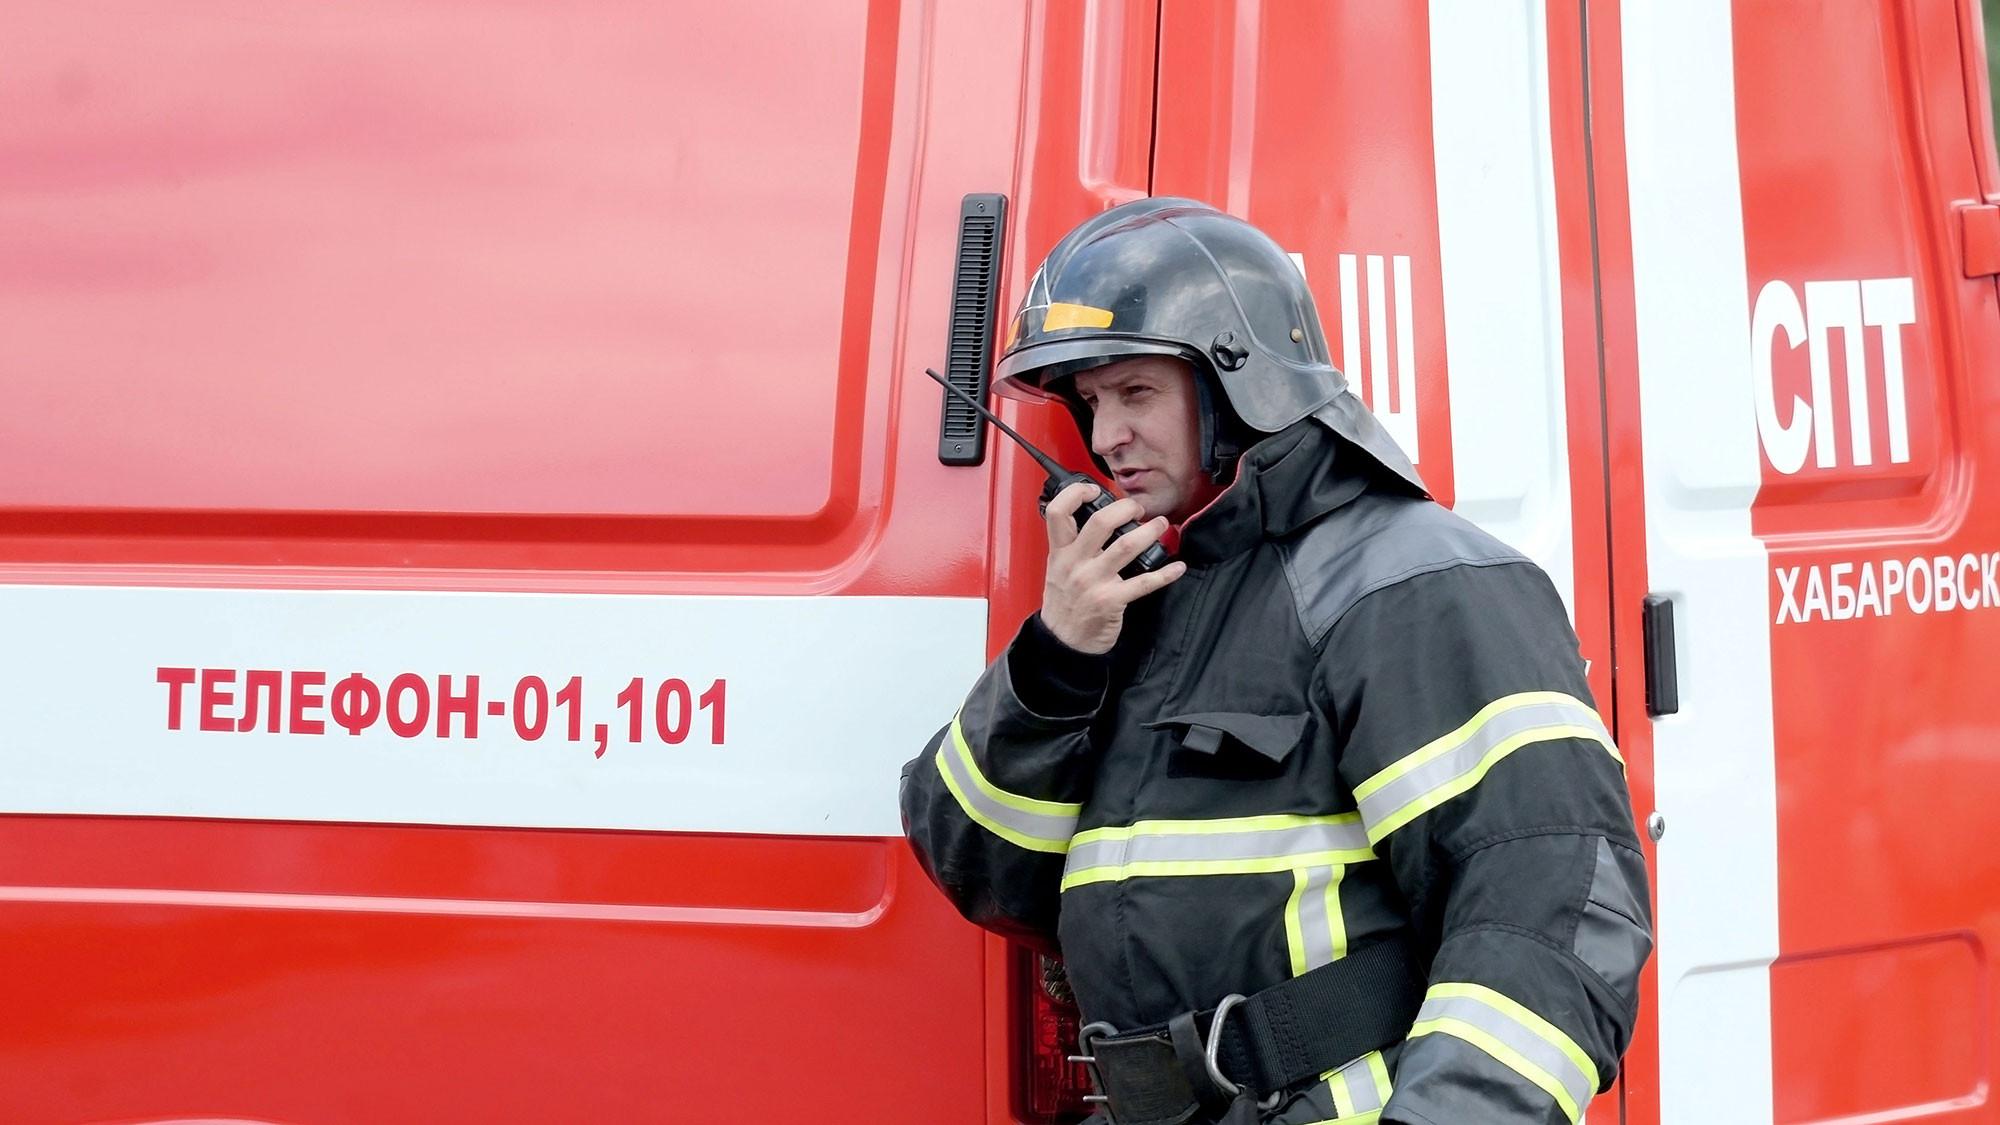 <p>Фото: &copy; РИА Новости /&nbsp;Игорь Онучин</p>